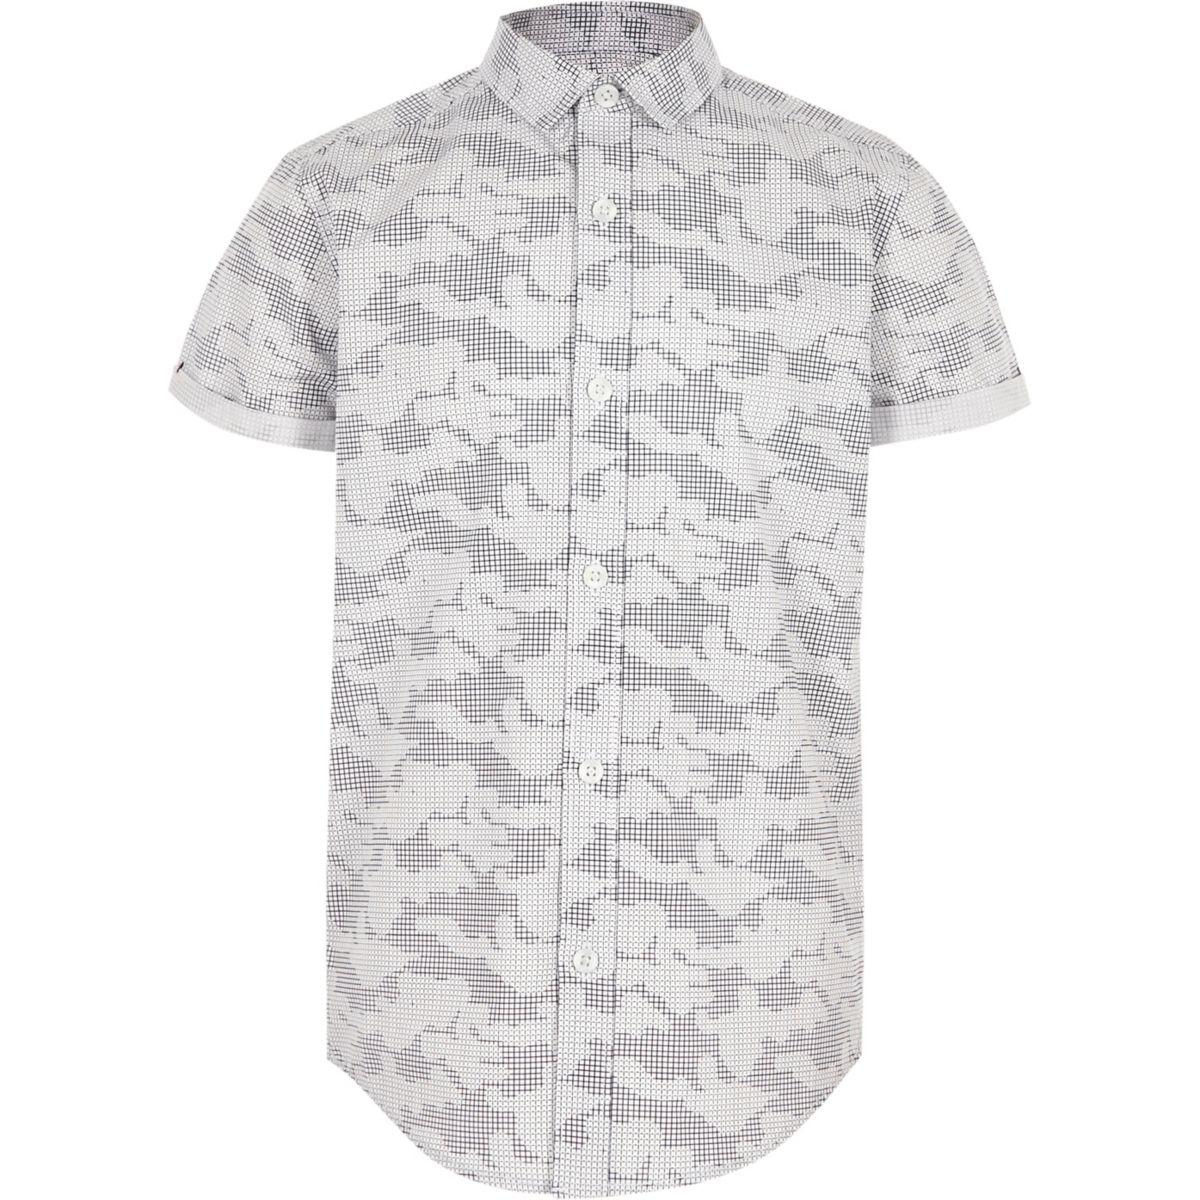 Boys grey digital camo short sleeve shirt